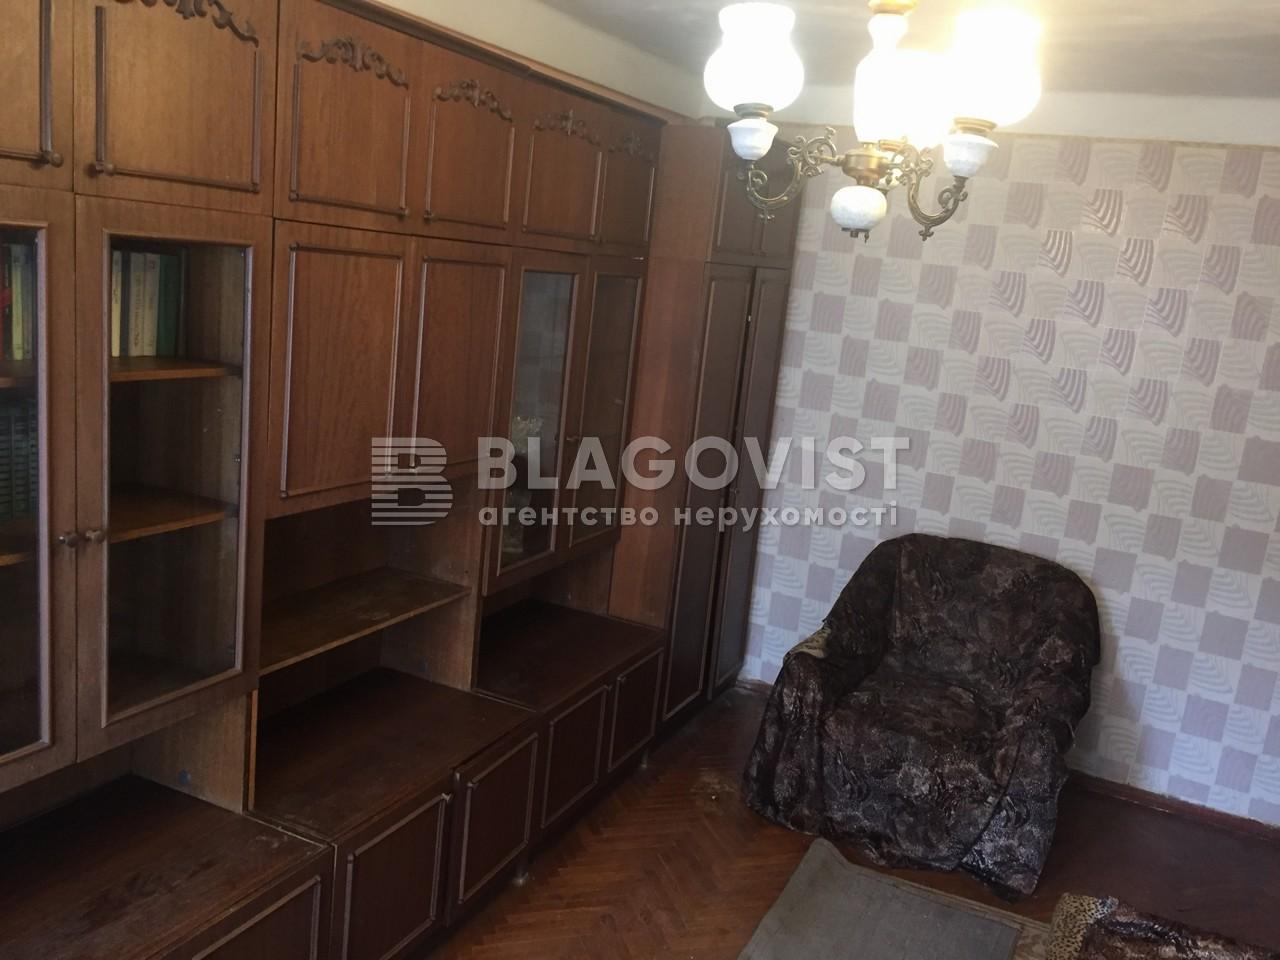 Квартира M-38783, Буслівська, 20, Київ - Фото 10